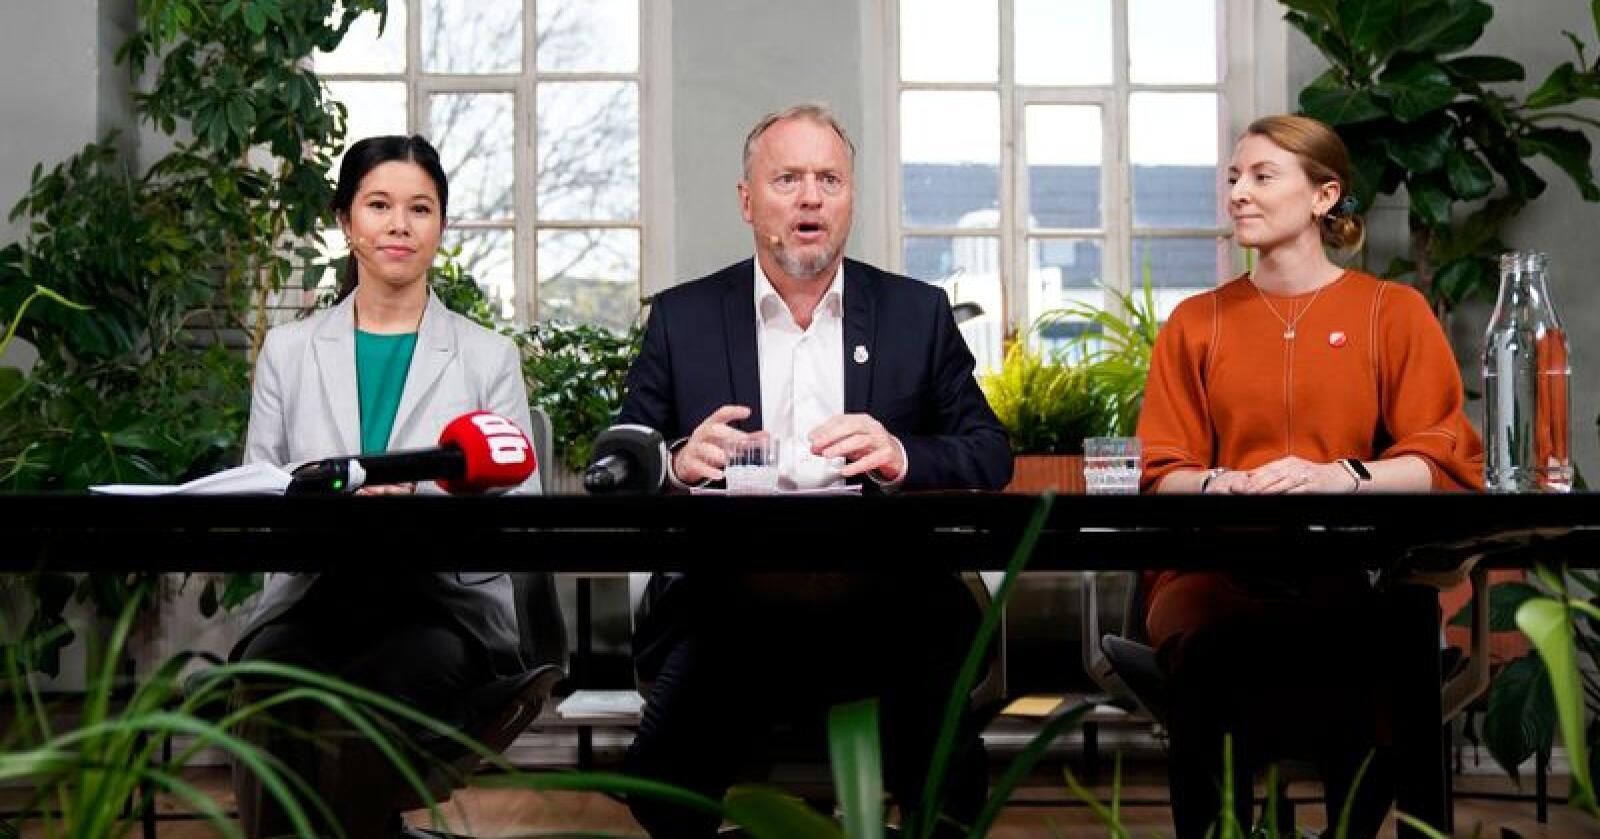 Lan Marie Berg (fv.) fra Miljøpartiet De Grønne, Raymond Johansen fra Arbeiderpartiet og Sunniva Holmås Eidsvoll fra Sosialistisk Venstreparti under pressekonferansen om byrådsforhandlingene i Oslo. Foto: Håkon Mosvold Larsen / NTB scanpix